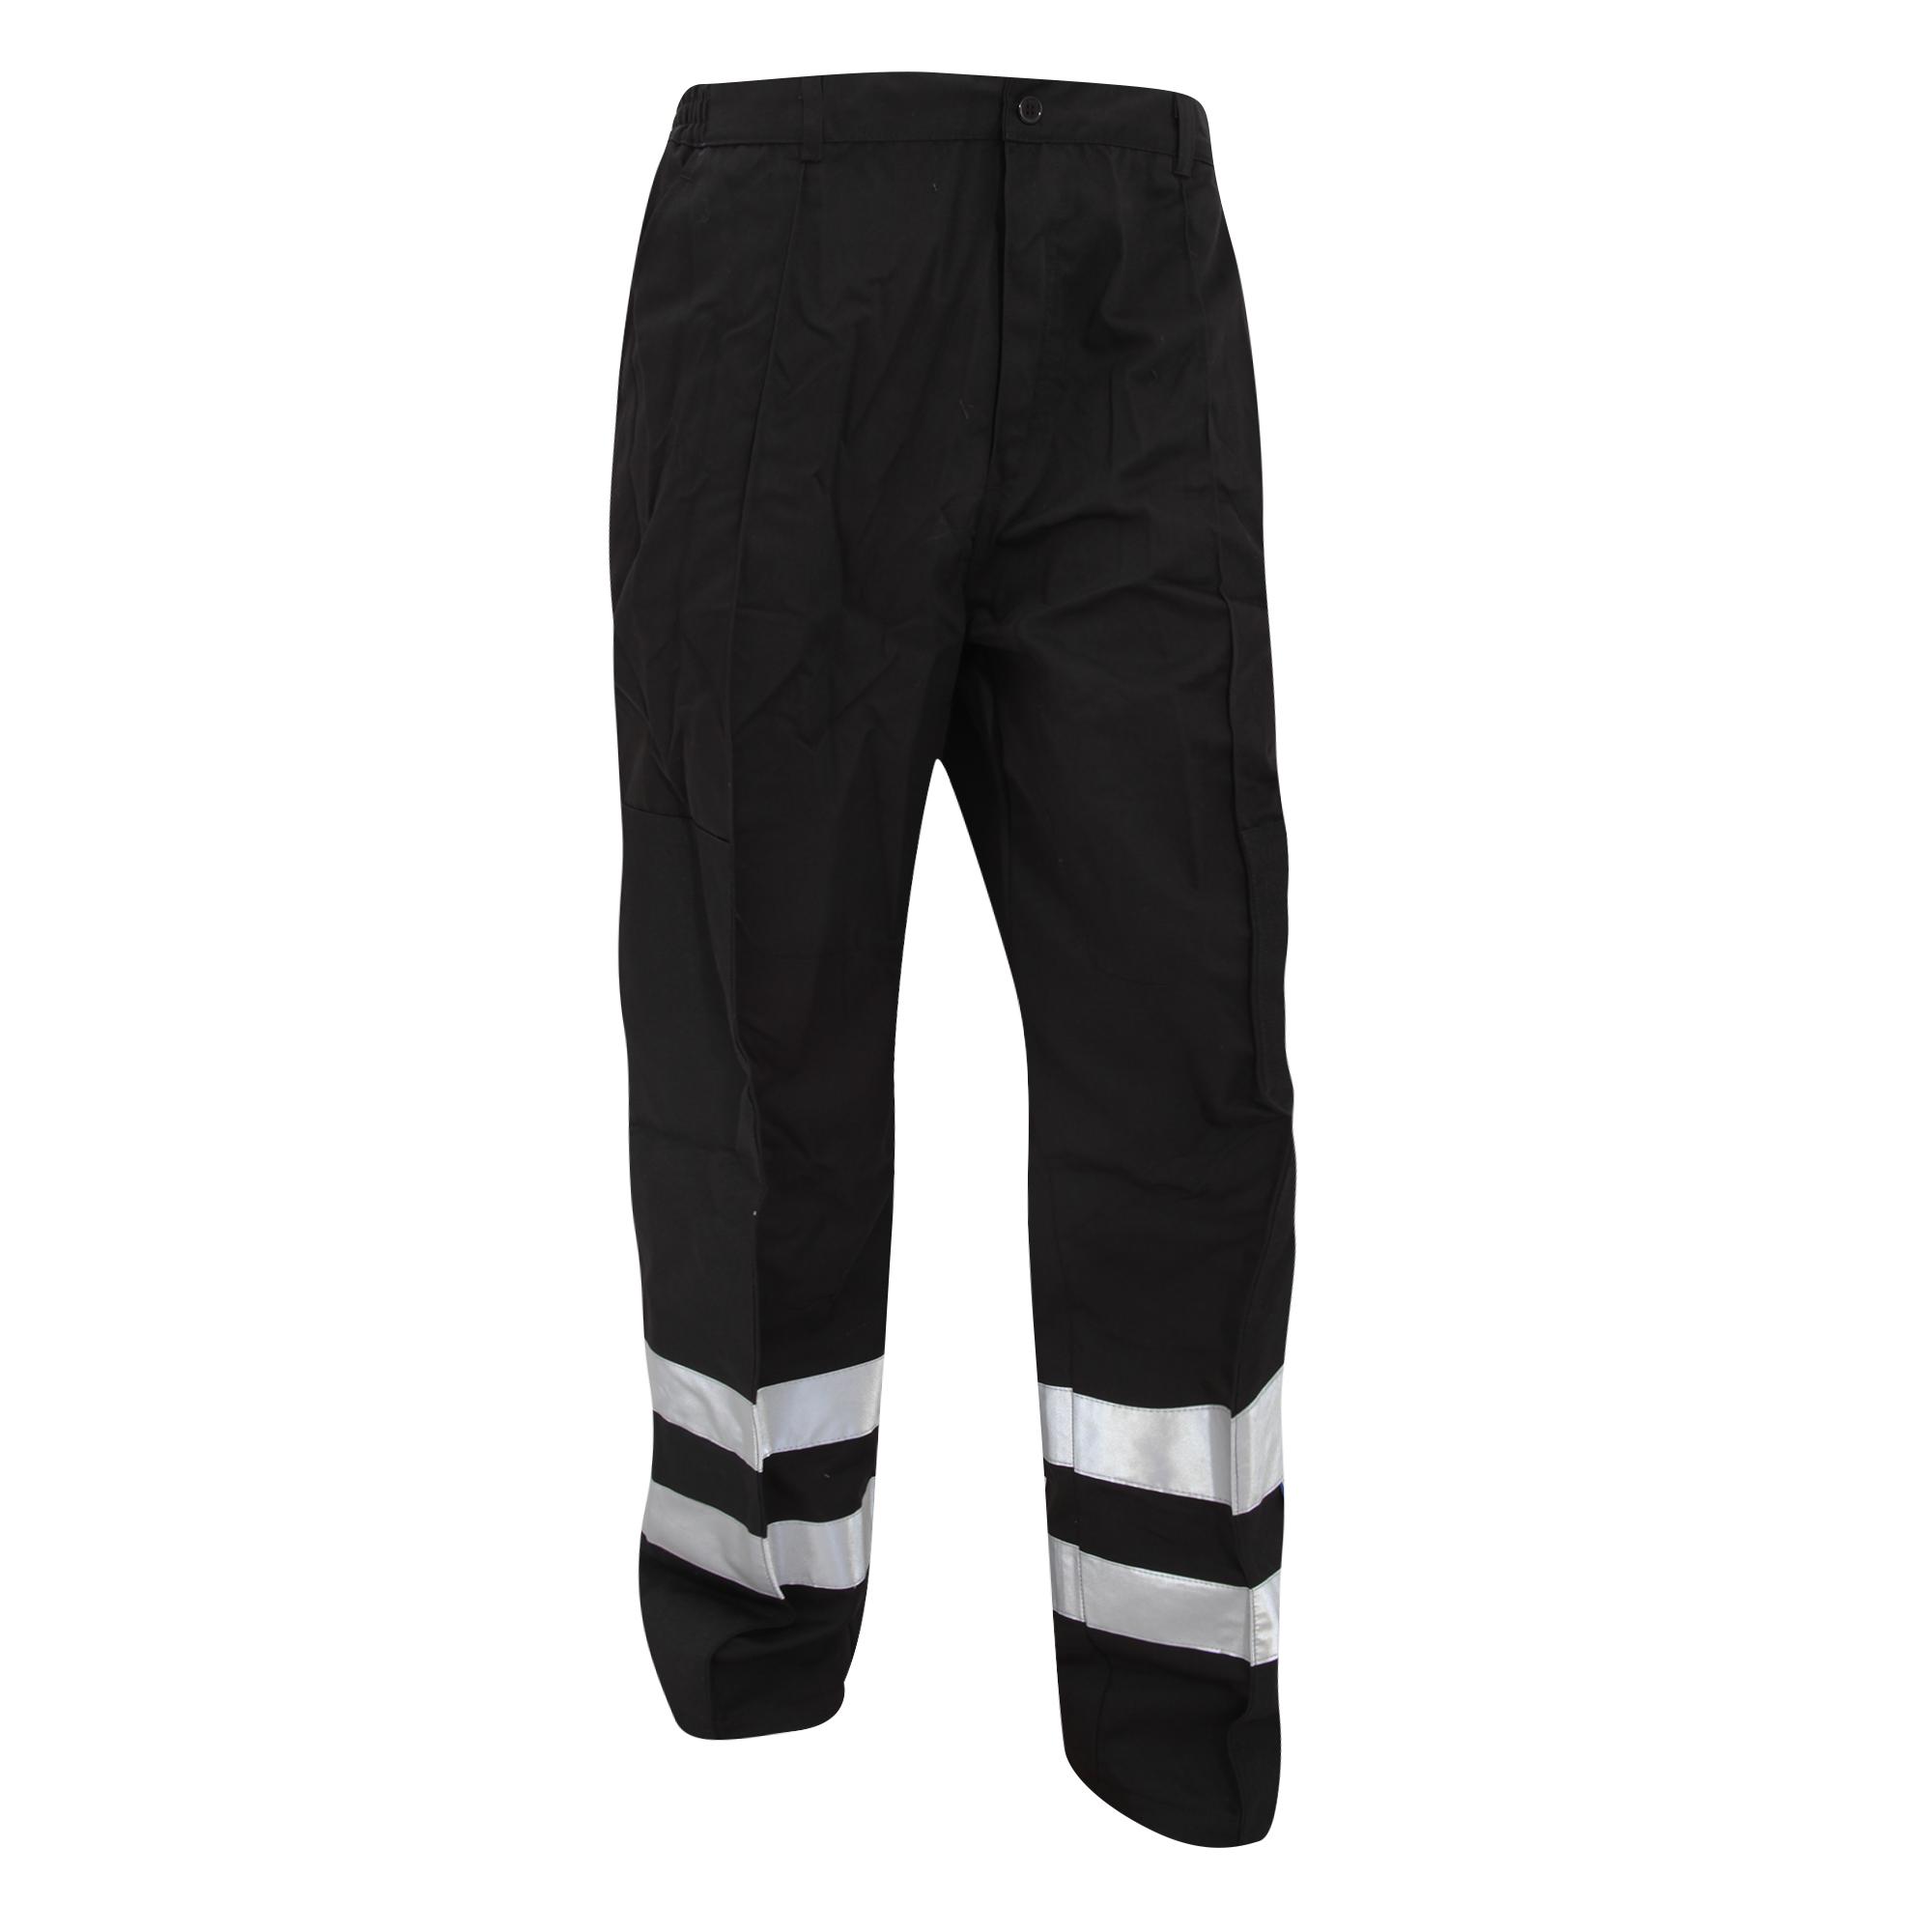 Yoko Mens Reflective Ballistic Trousers (Regular) / Hi Vis Workwear (36W x Regular) (Black)